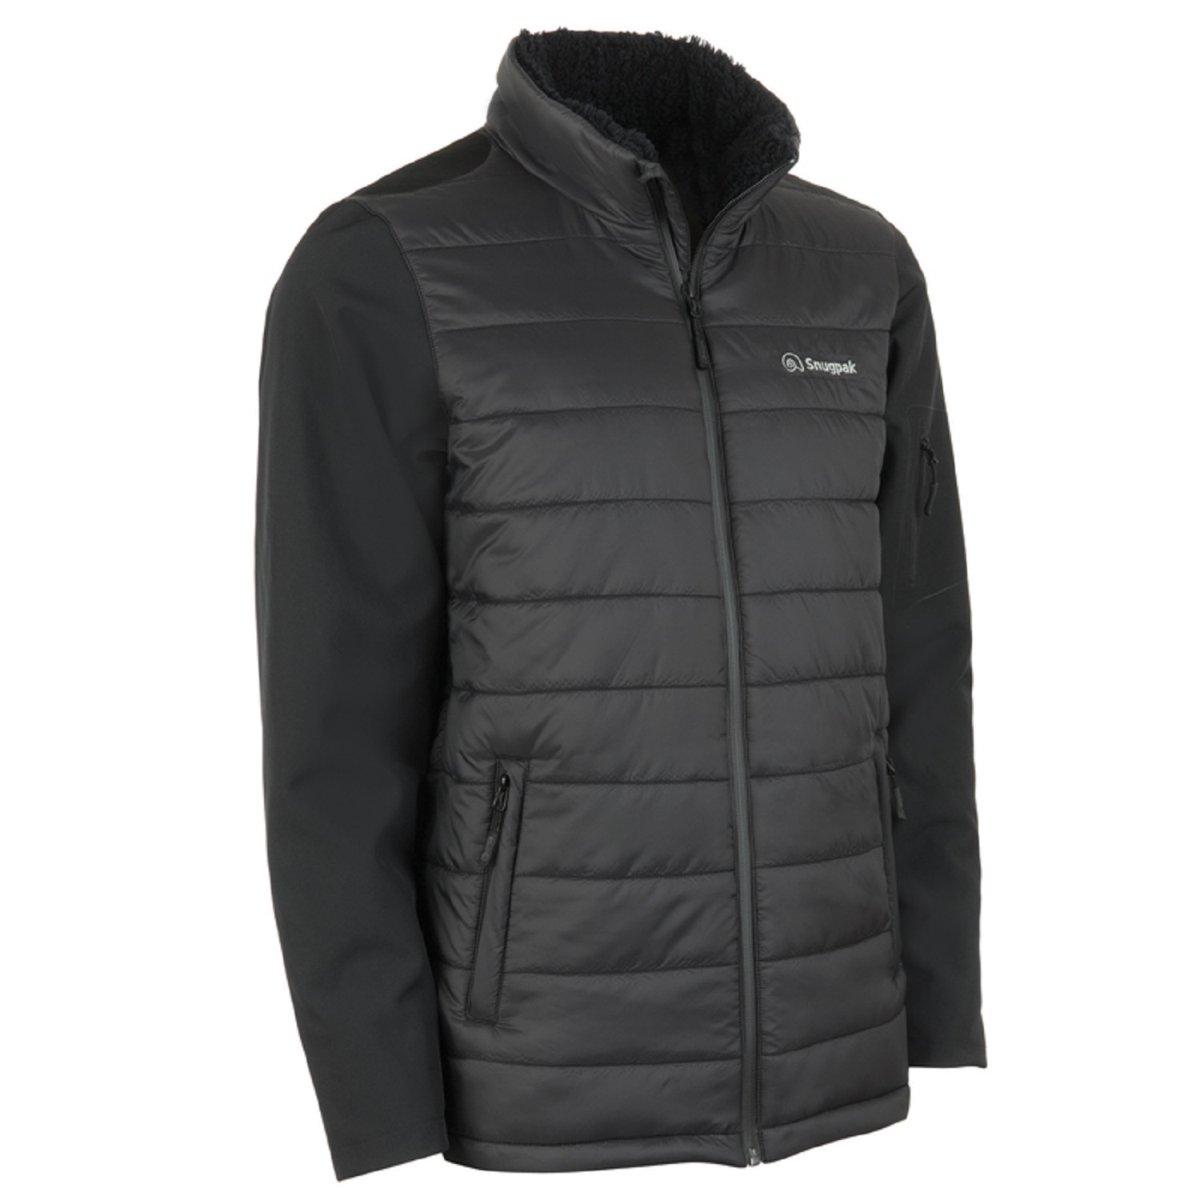 Snugpak - Fusion Insulated Jacket - Black - S